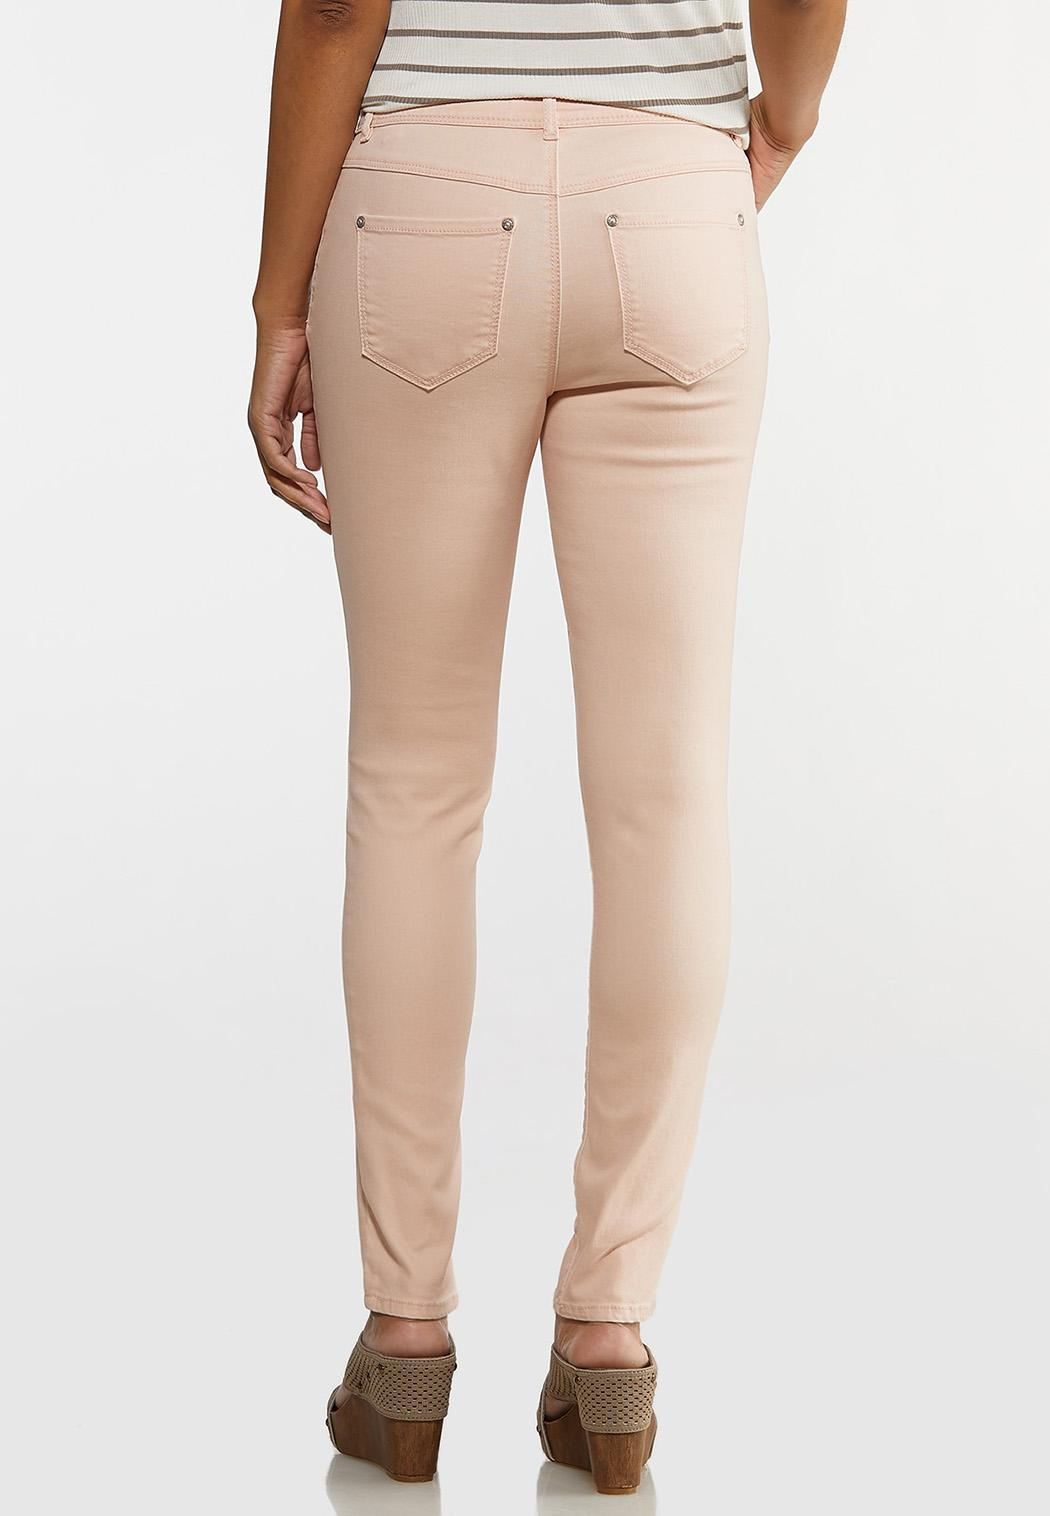 Blush Skinny Jeans (Item #44222112)